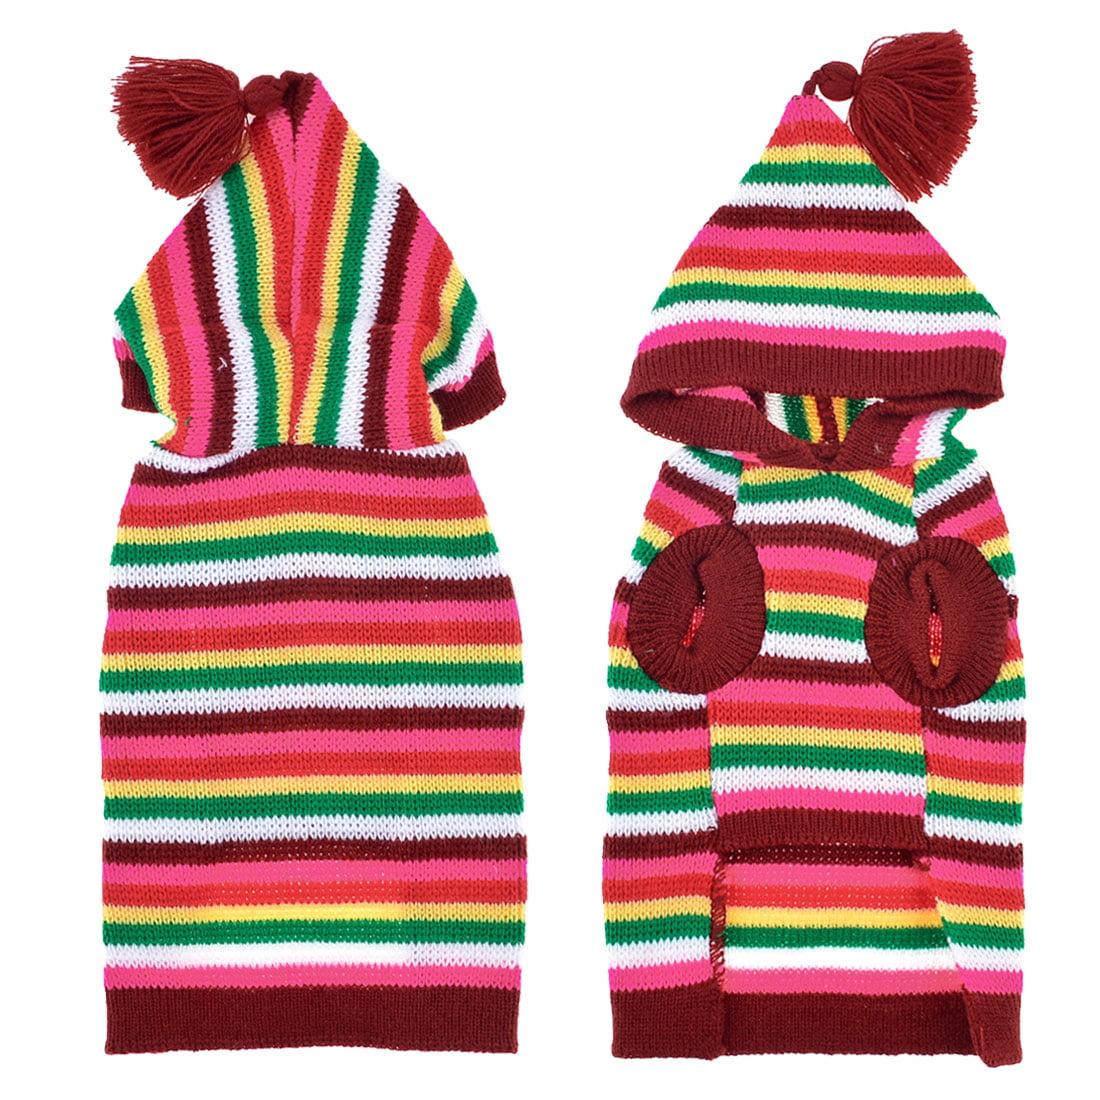 Unique Bargains Colored Hooded Knit Pet Doggie Shih Tzu Sweater Clothing Coat Apparel L